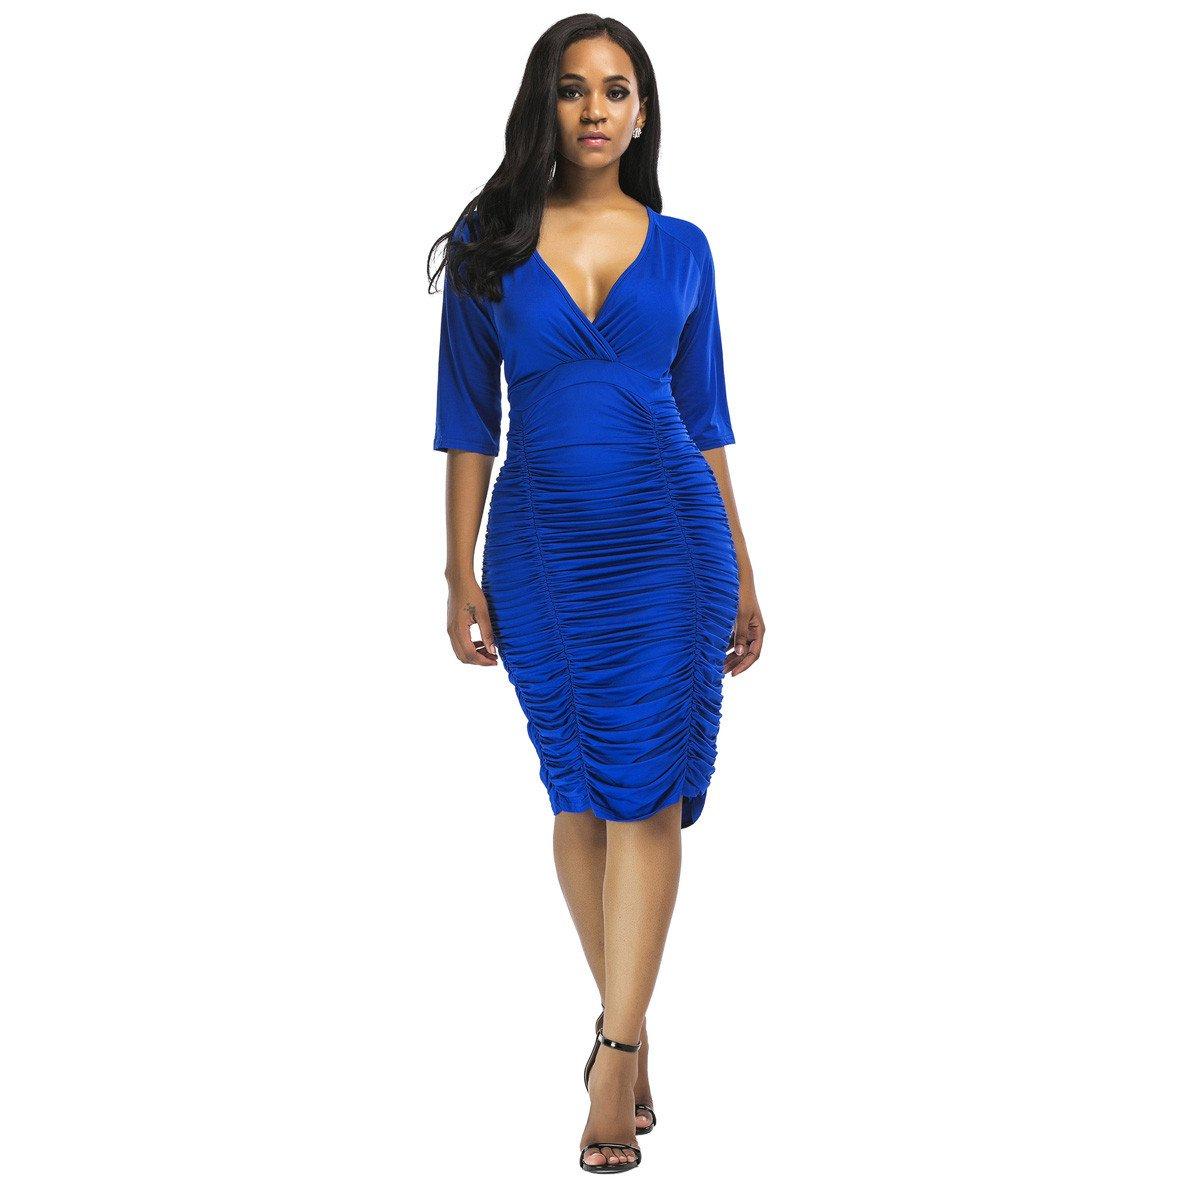 b59fc56cfc6eeb Women  s Sexy Deep V Neck Nightclub Dresses